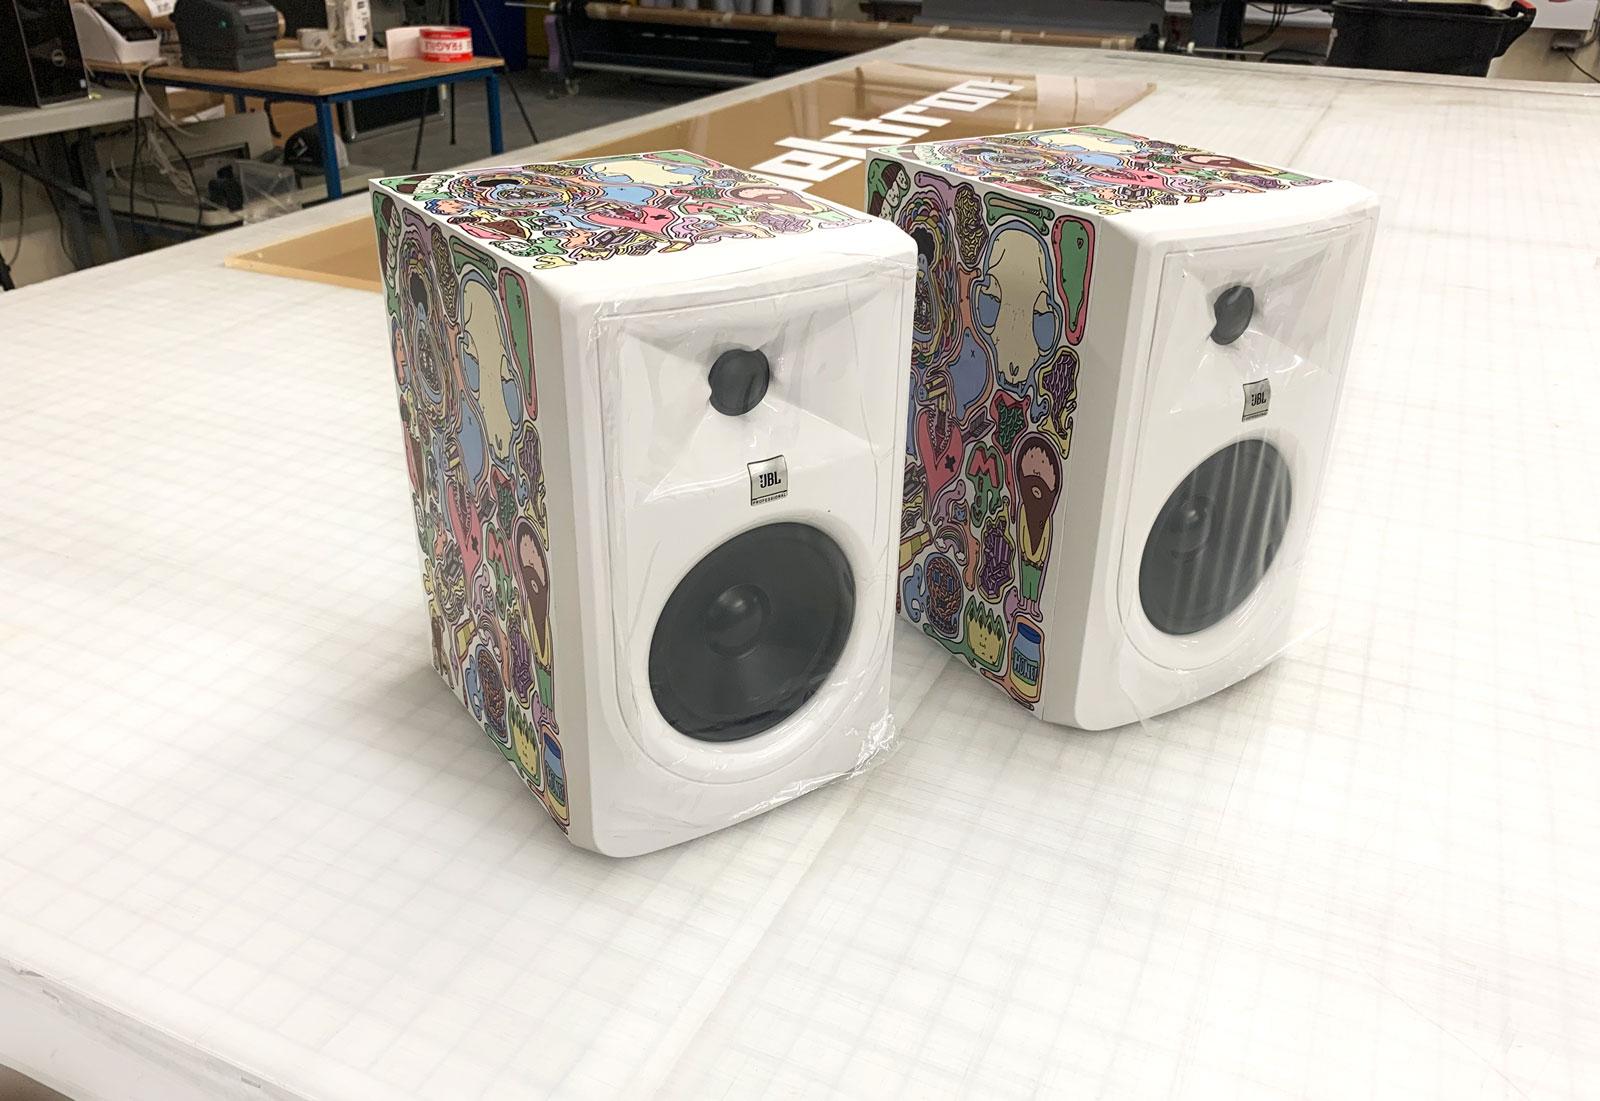 JBL speakers with custom Stickers